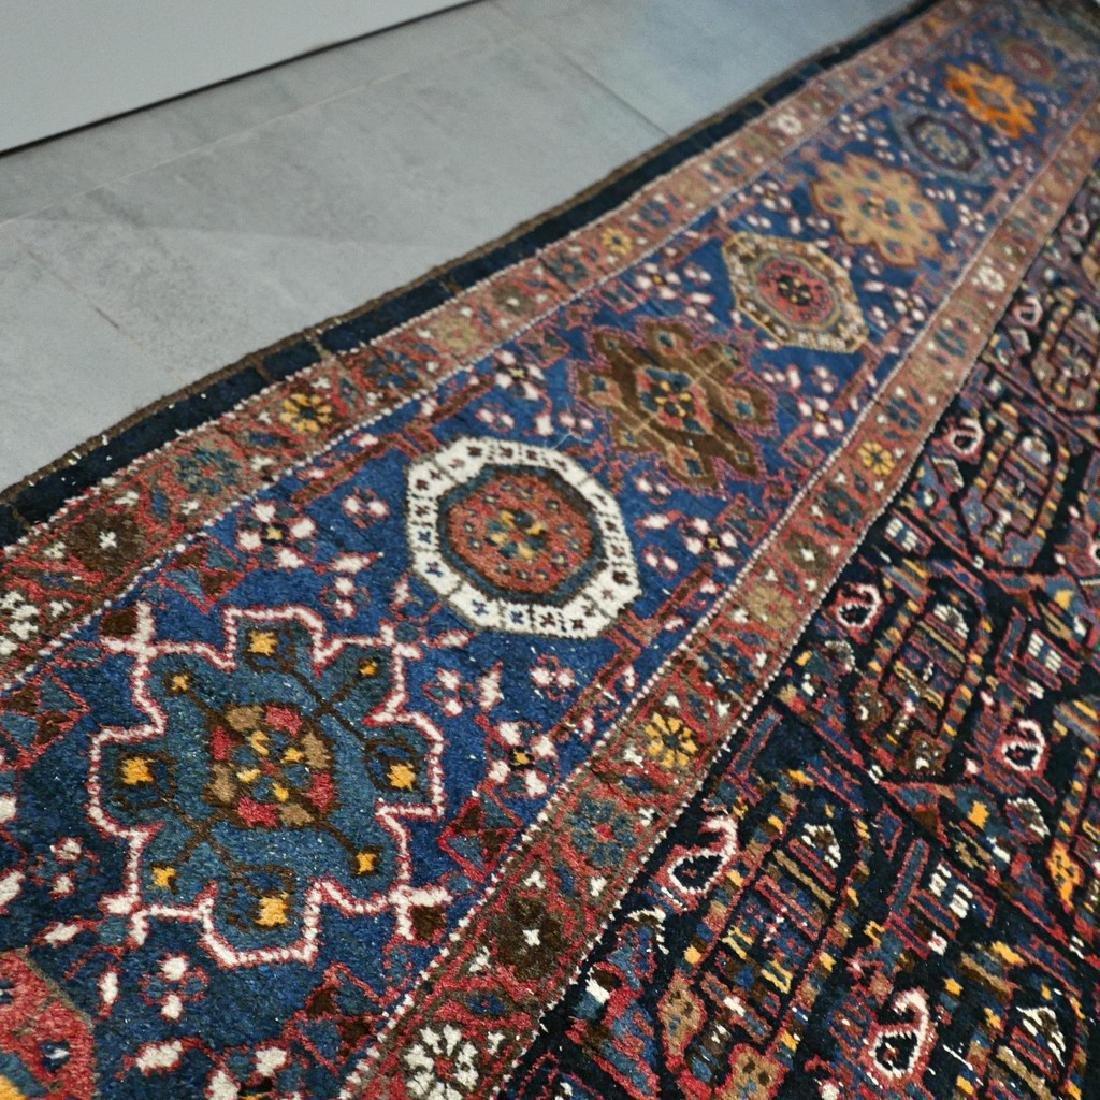 10.1x4.3 Antique Armenian boteh Kazak rug - 1880s - - 8